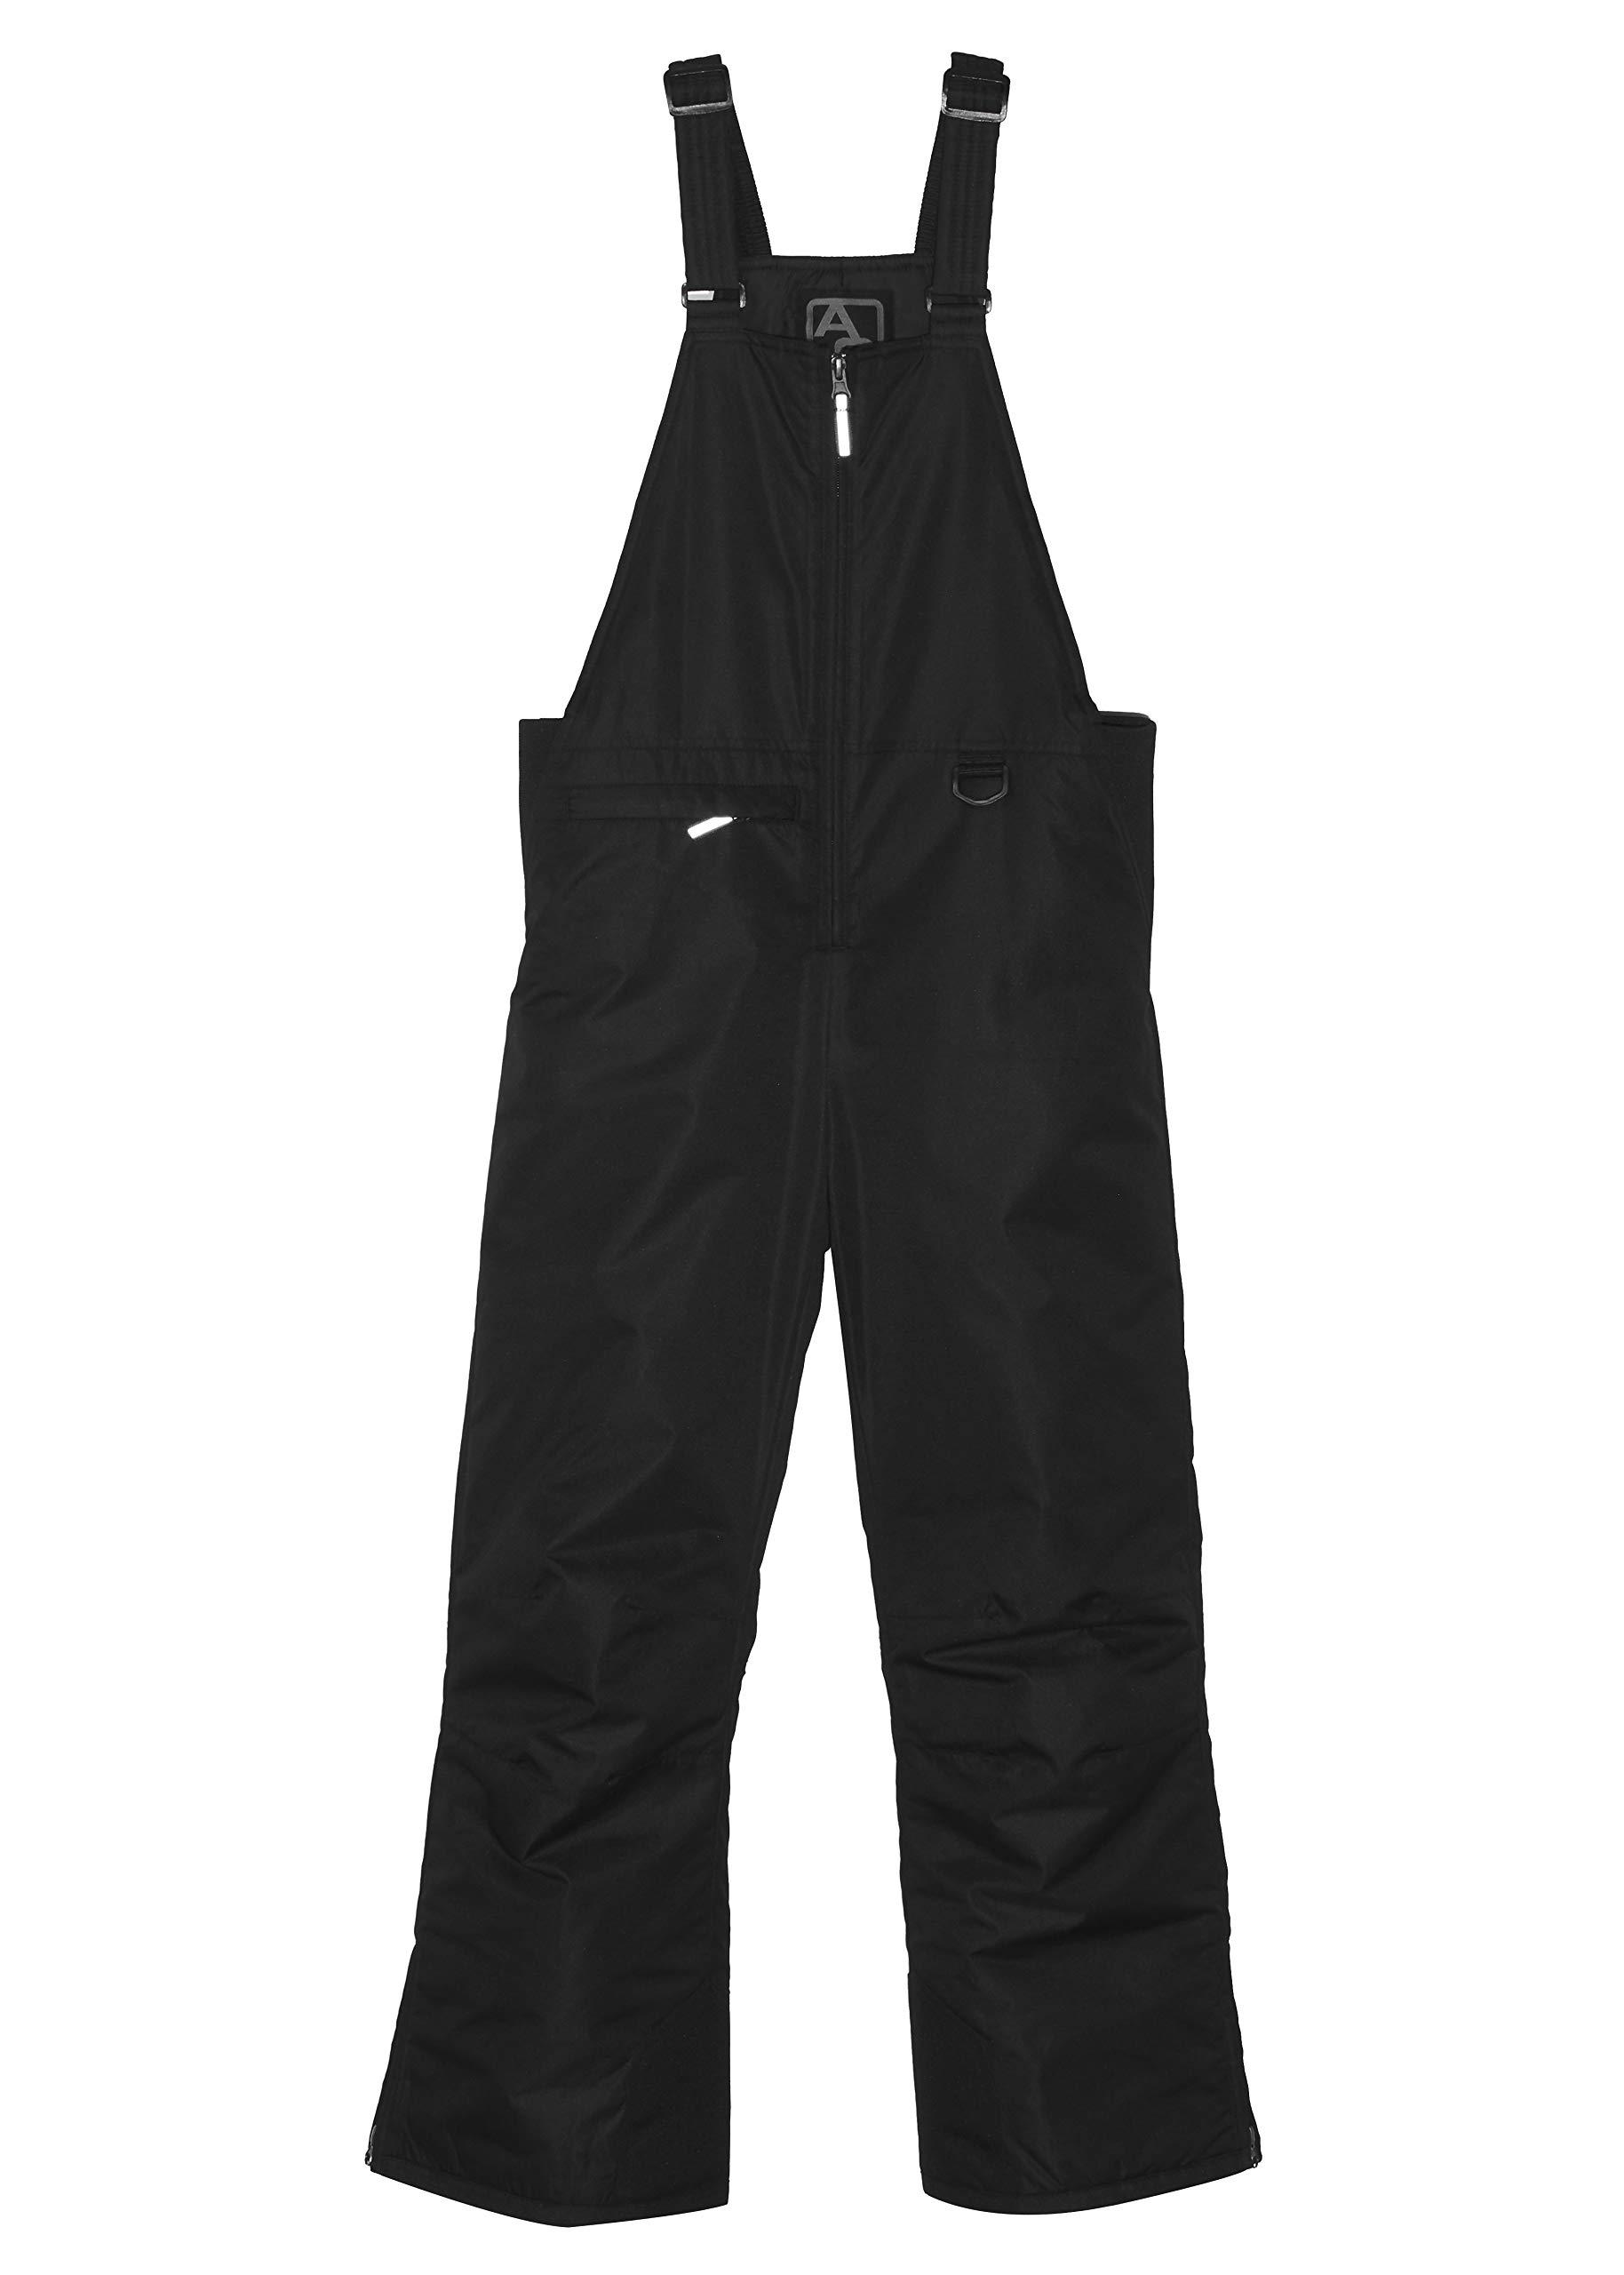 Arctic Quest Unisex Boys and Girls Unisex Ski & Snow Bib Overall, Black, 12/14